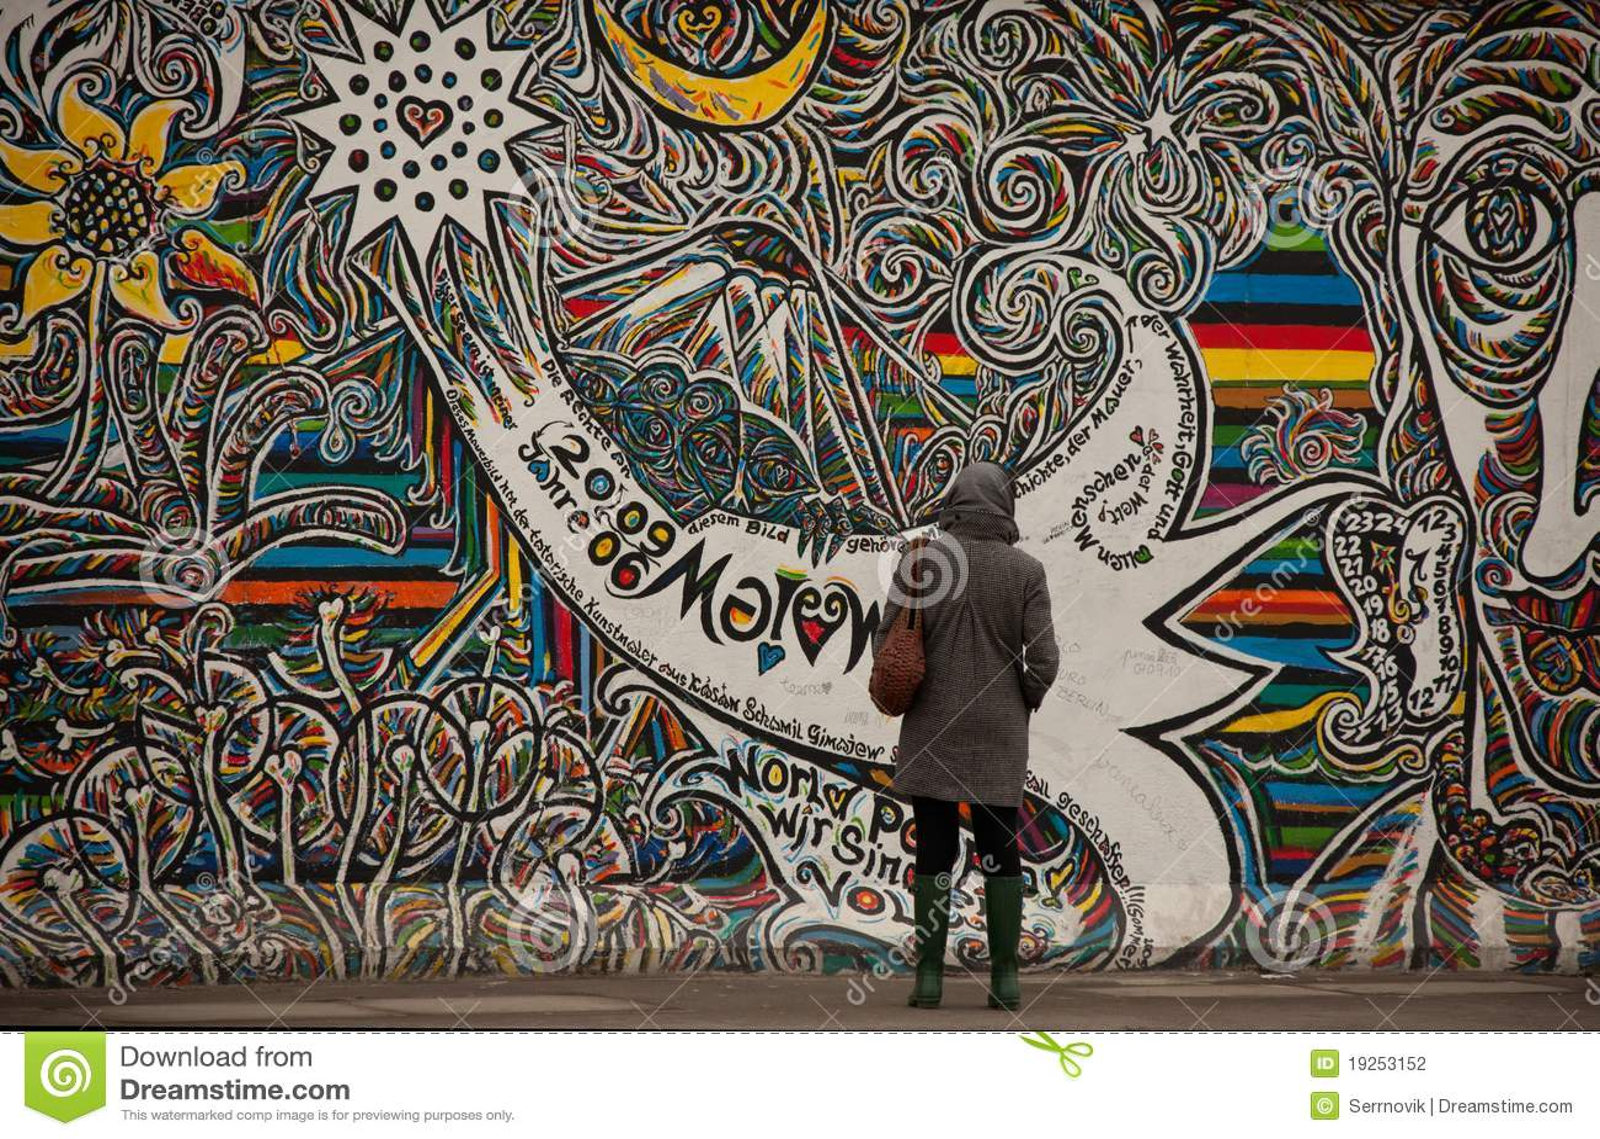 Grafiti wall berlin - Berlin East Gallery Germany Graffiti Tourists Wall